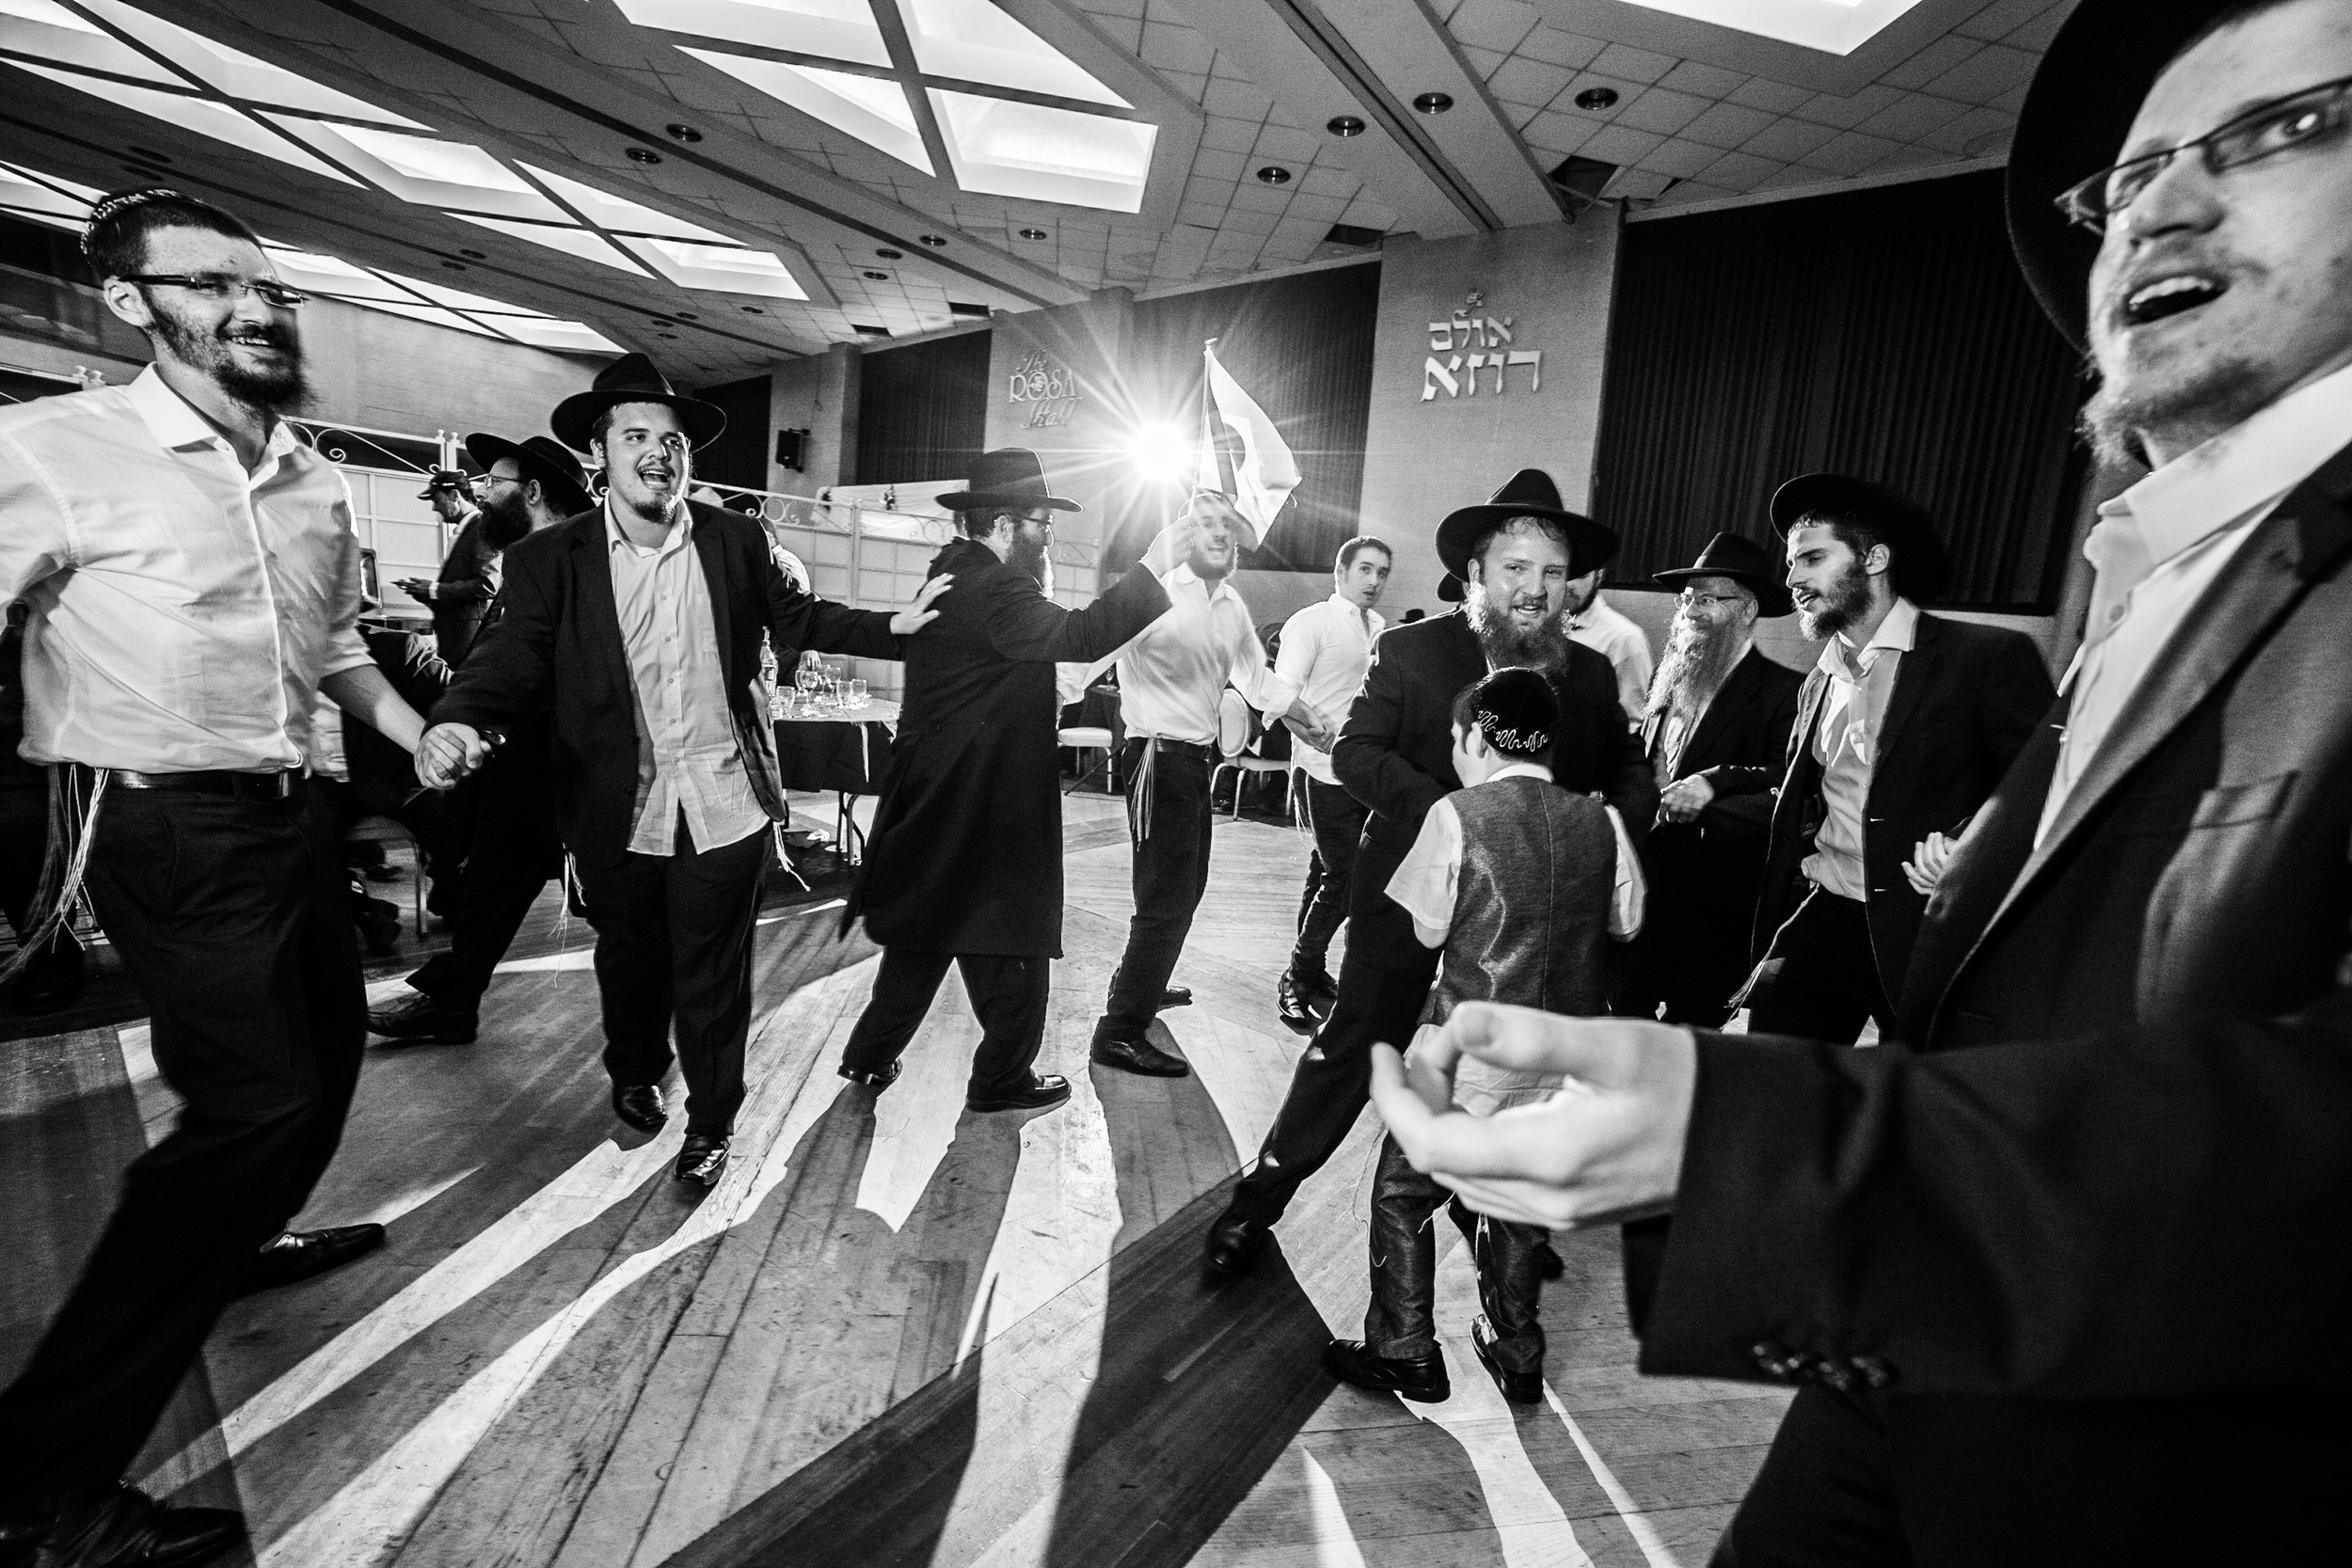 Wedding Iossi and Gitty Khafif  - Eliau Piha studio photography, new york, events, people 770 brooklyn -0980.jpg